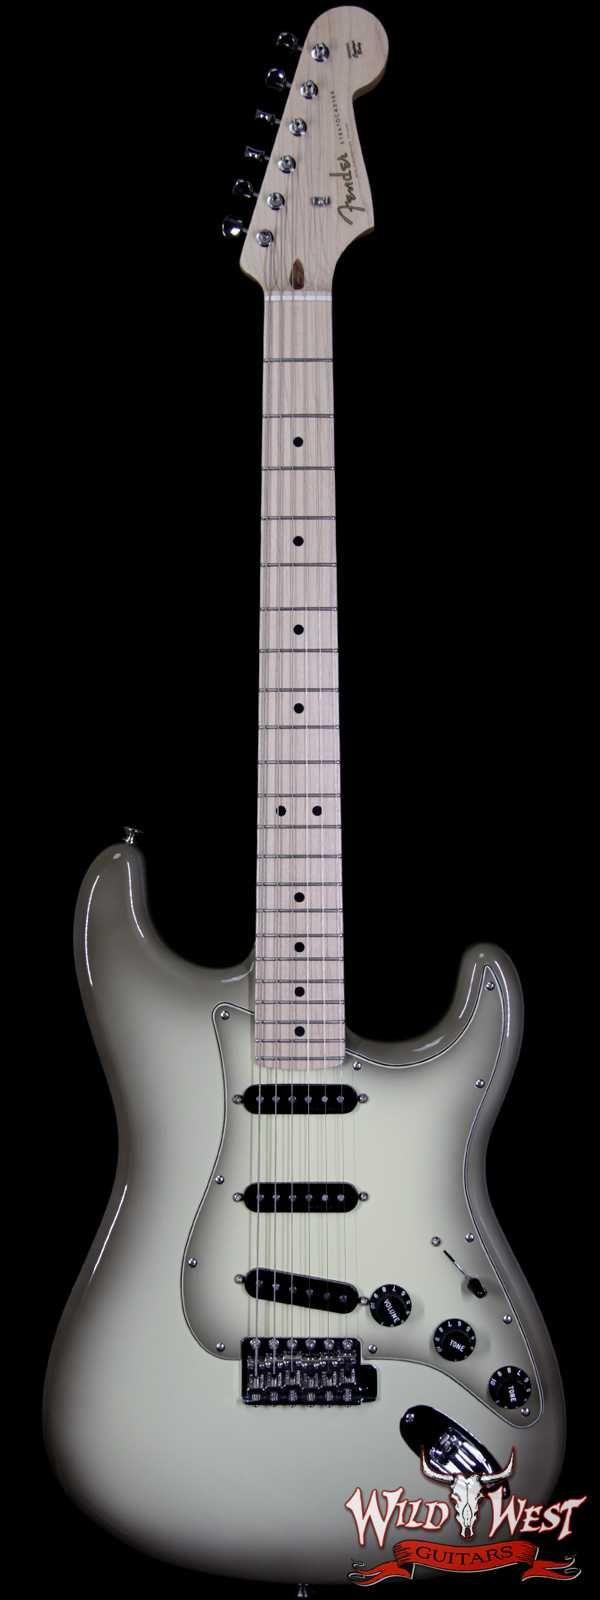 2008 Fender Custom Shop Eric Clapton 10th Anniversary of Crossroads Stratocaster Antigua 80 of 100